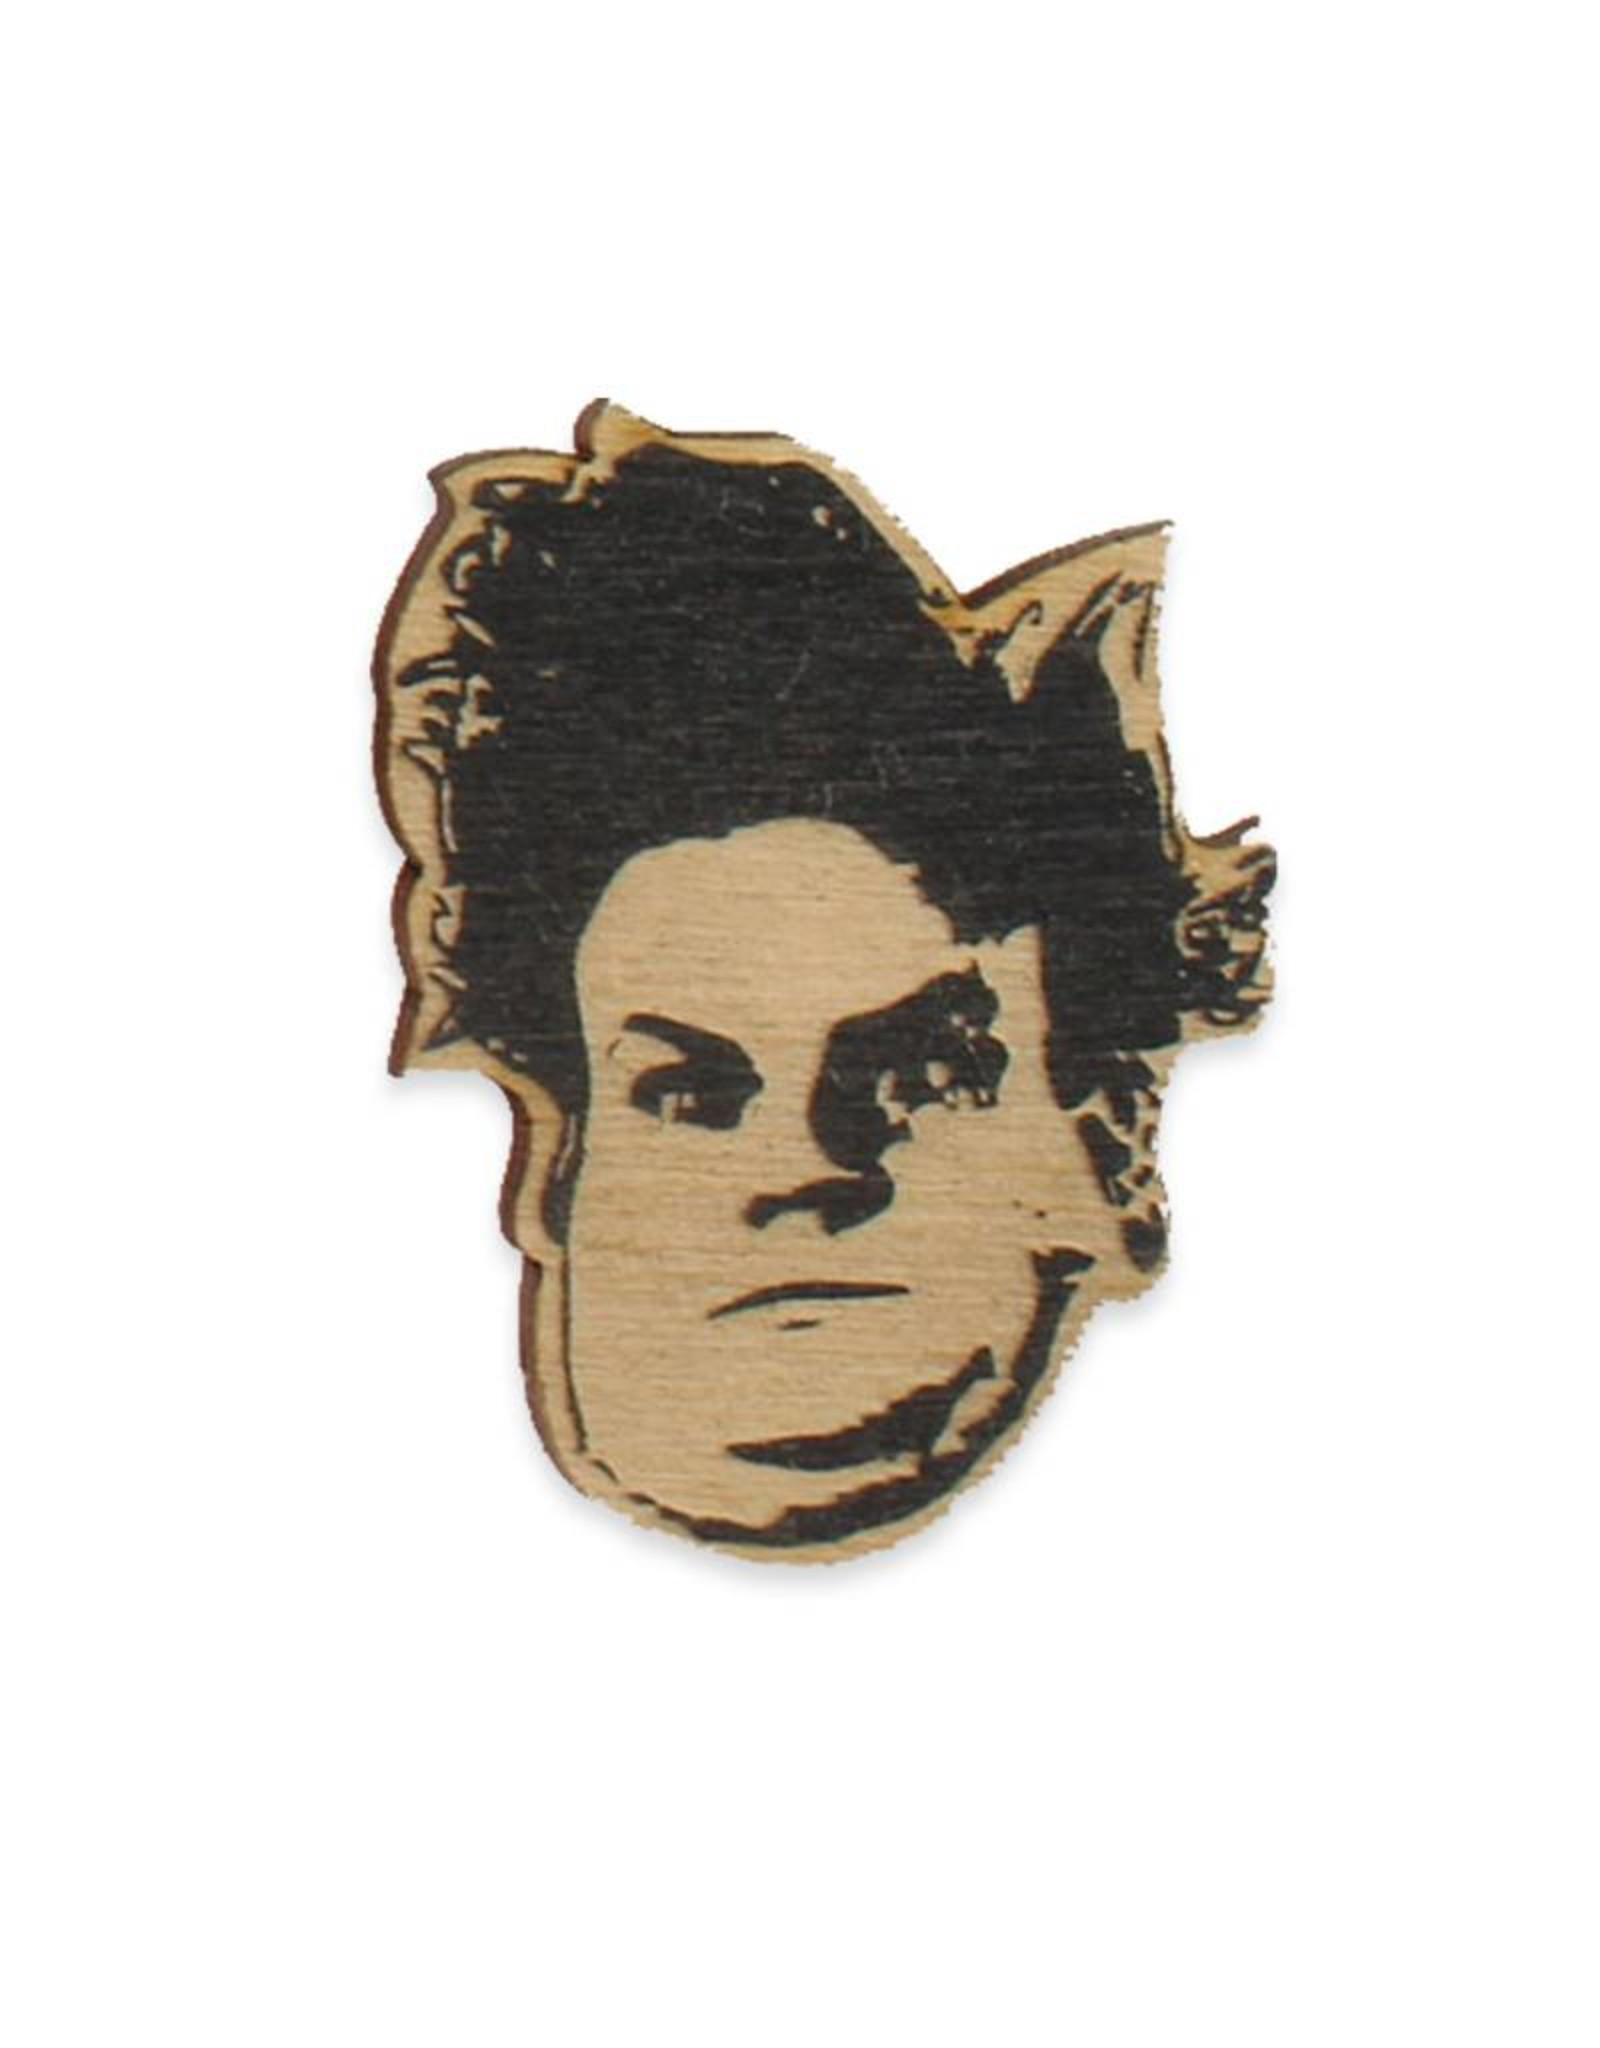 Chris Farley Wooden Pin